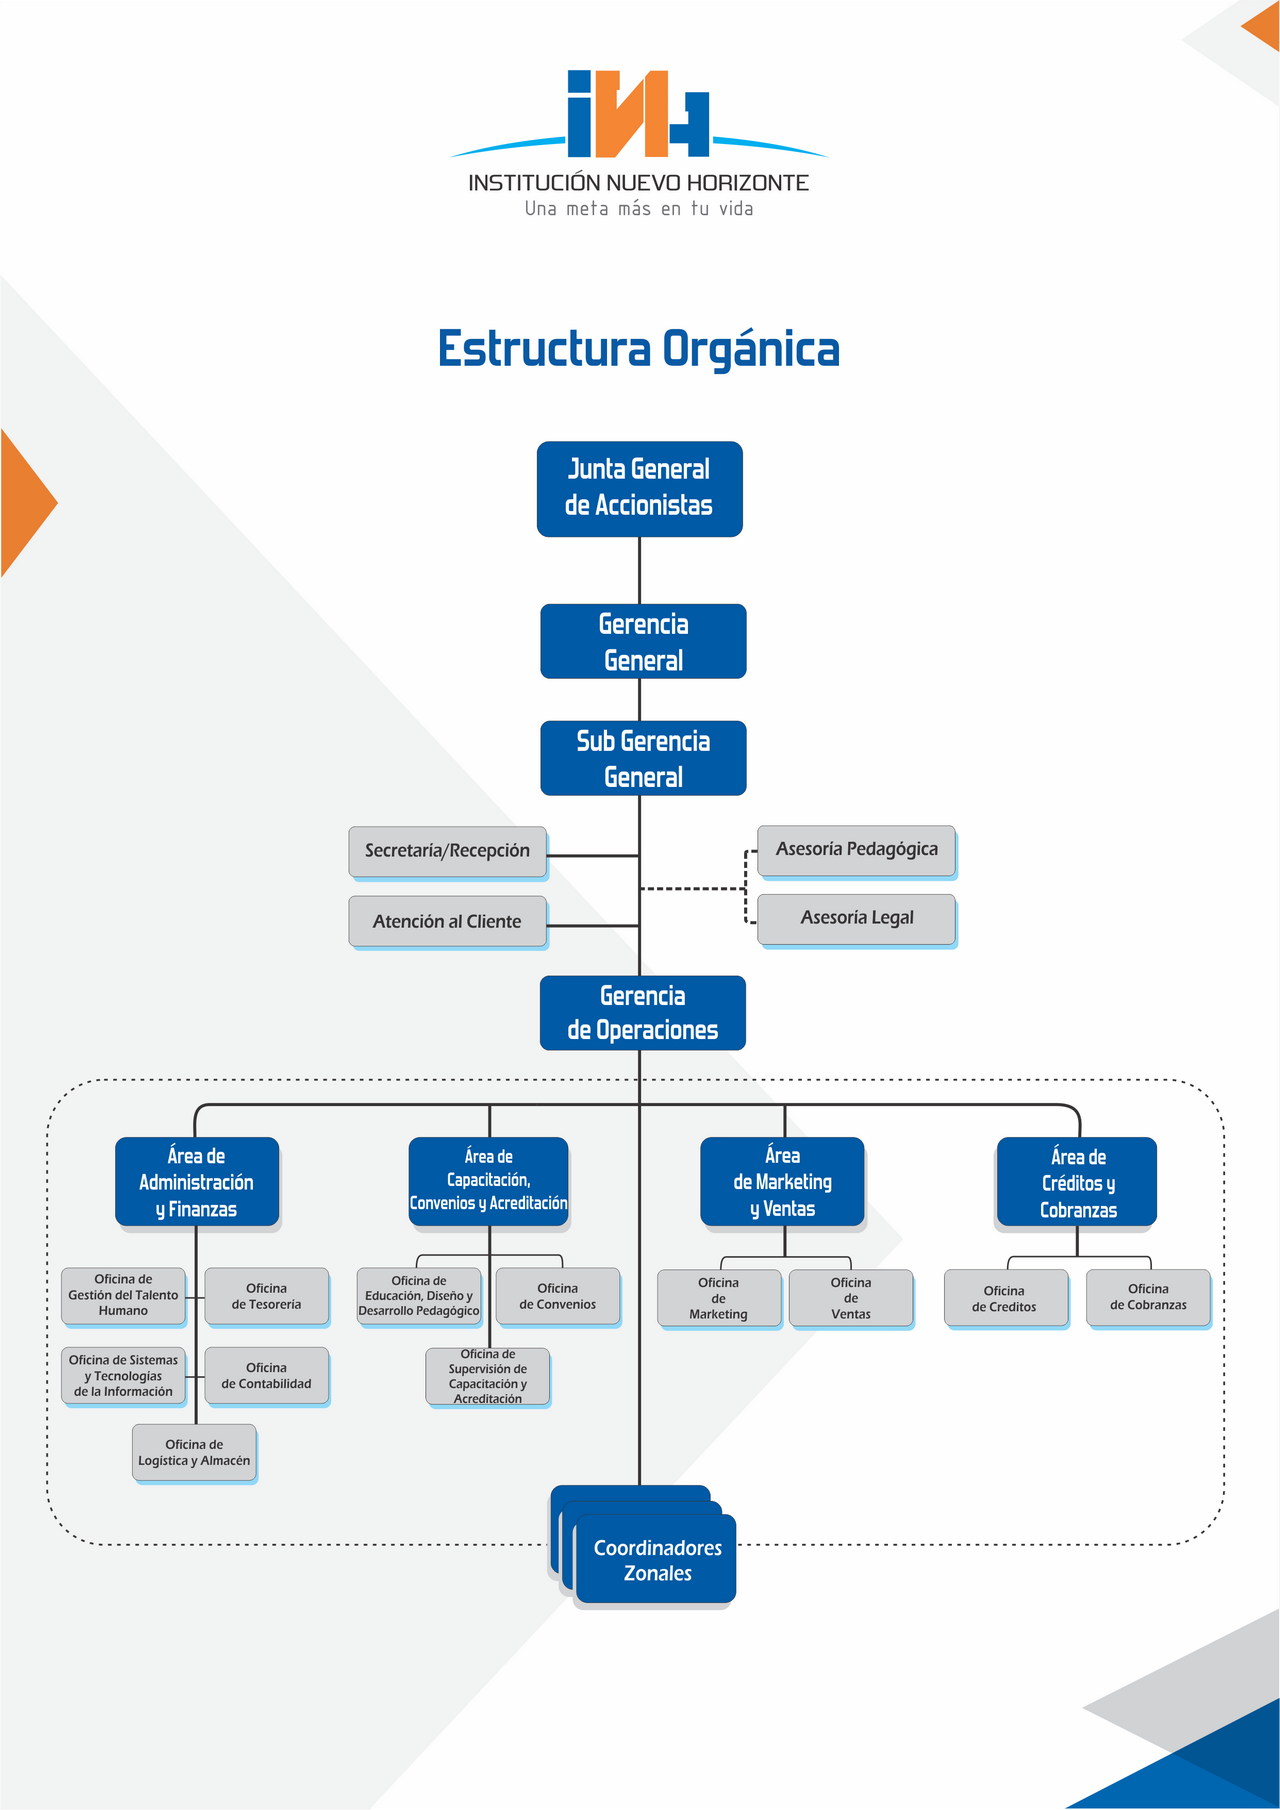 ESTRUCTURA ORGANICA INHSAC-2016 (1) (Copiar)